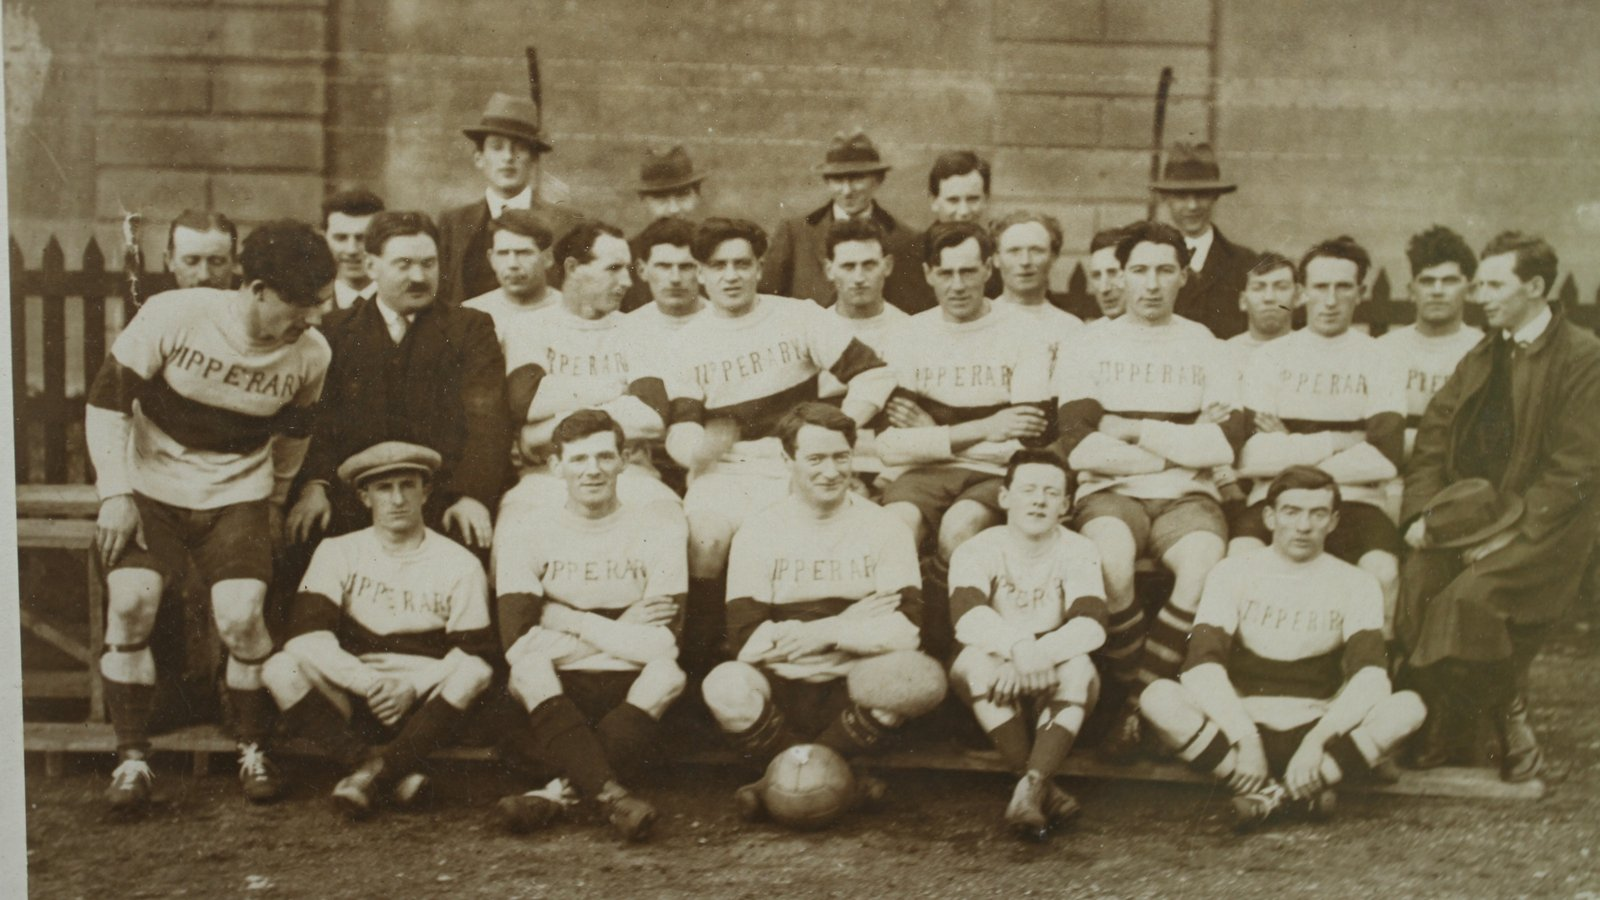 Image - Tipperary team, Croke Park 21 November 1920 (Credit: GAA Museum, Croke Park)